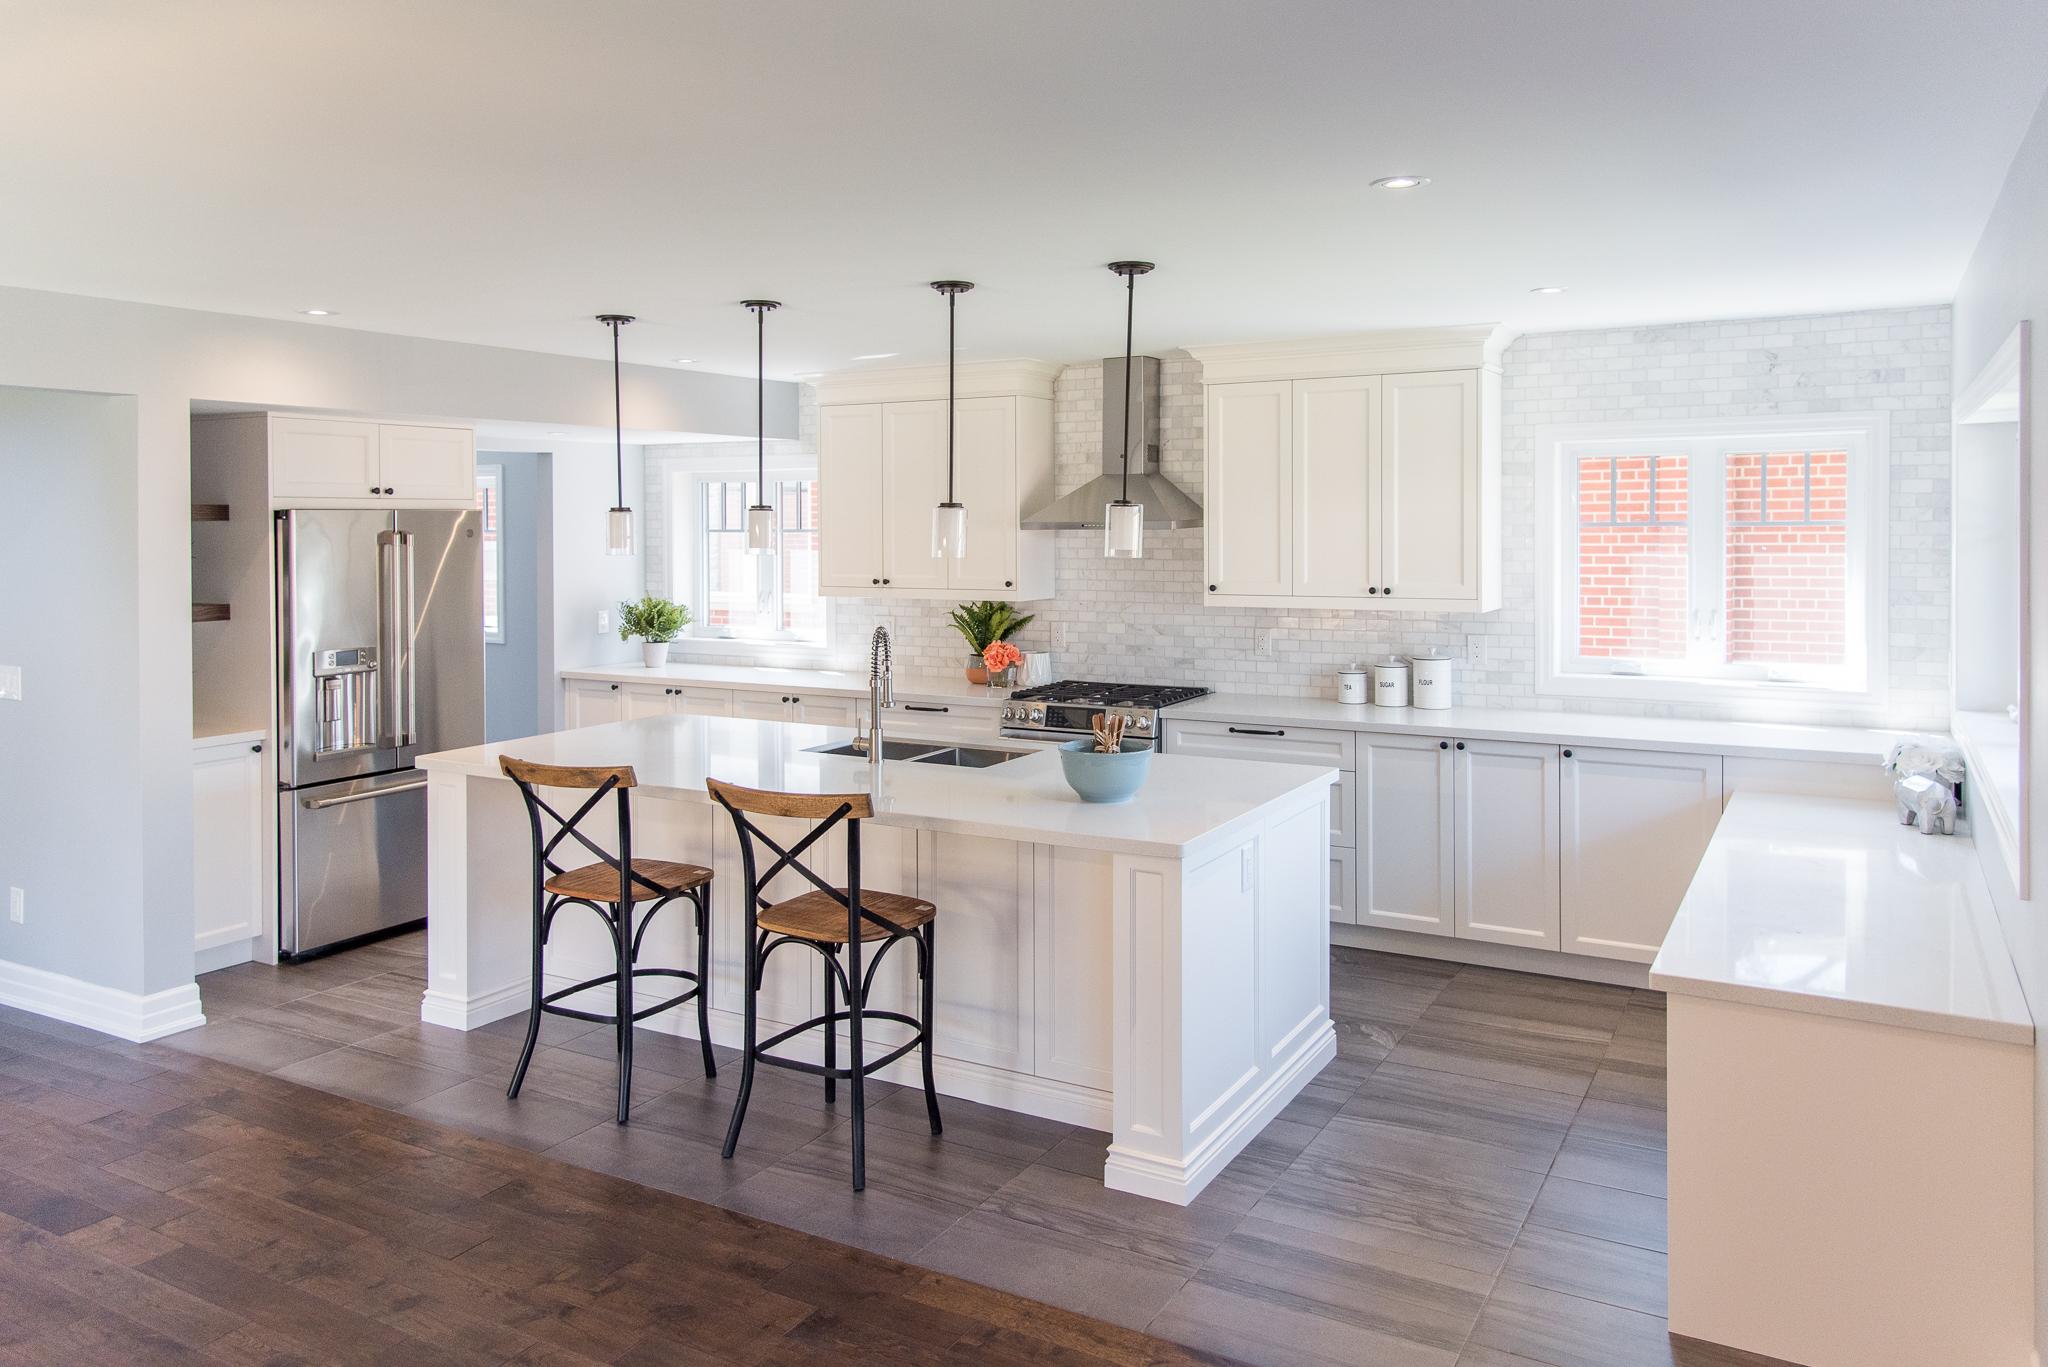 Hamilton Commercial Photographer - Interiors - Kitchen 001-2.JPG